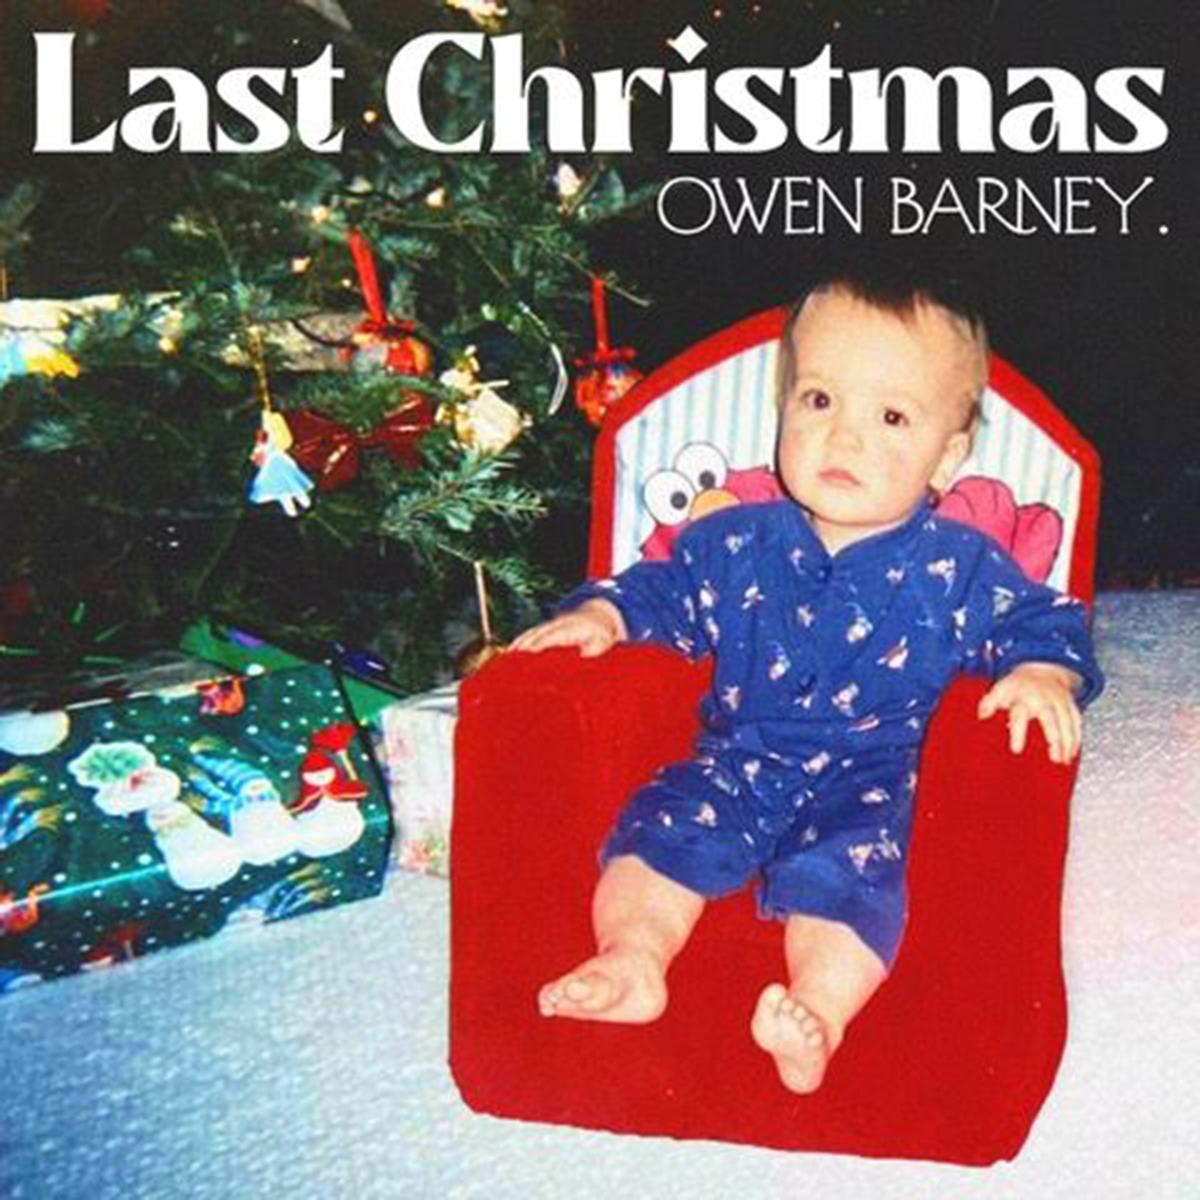 Owen Barney - Last Christmas